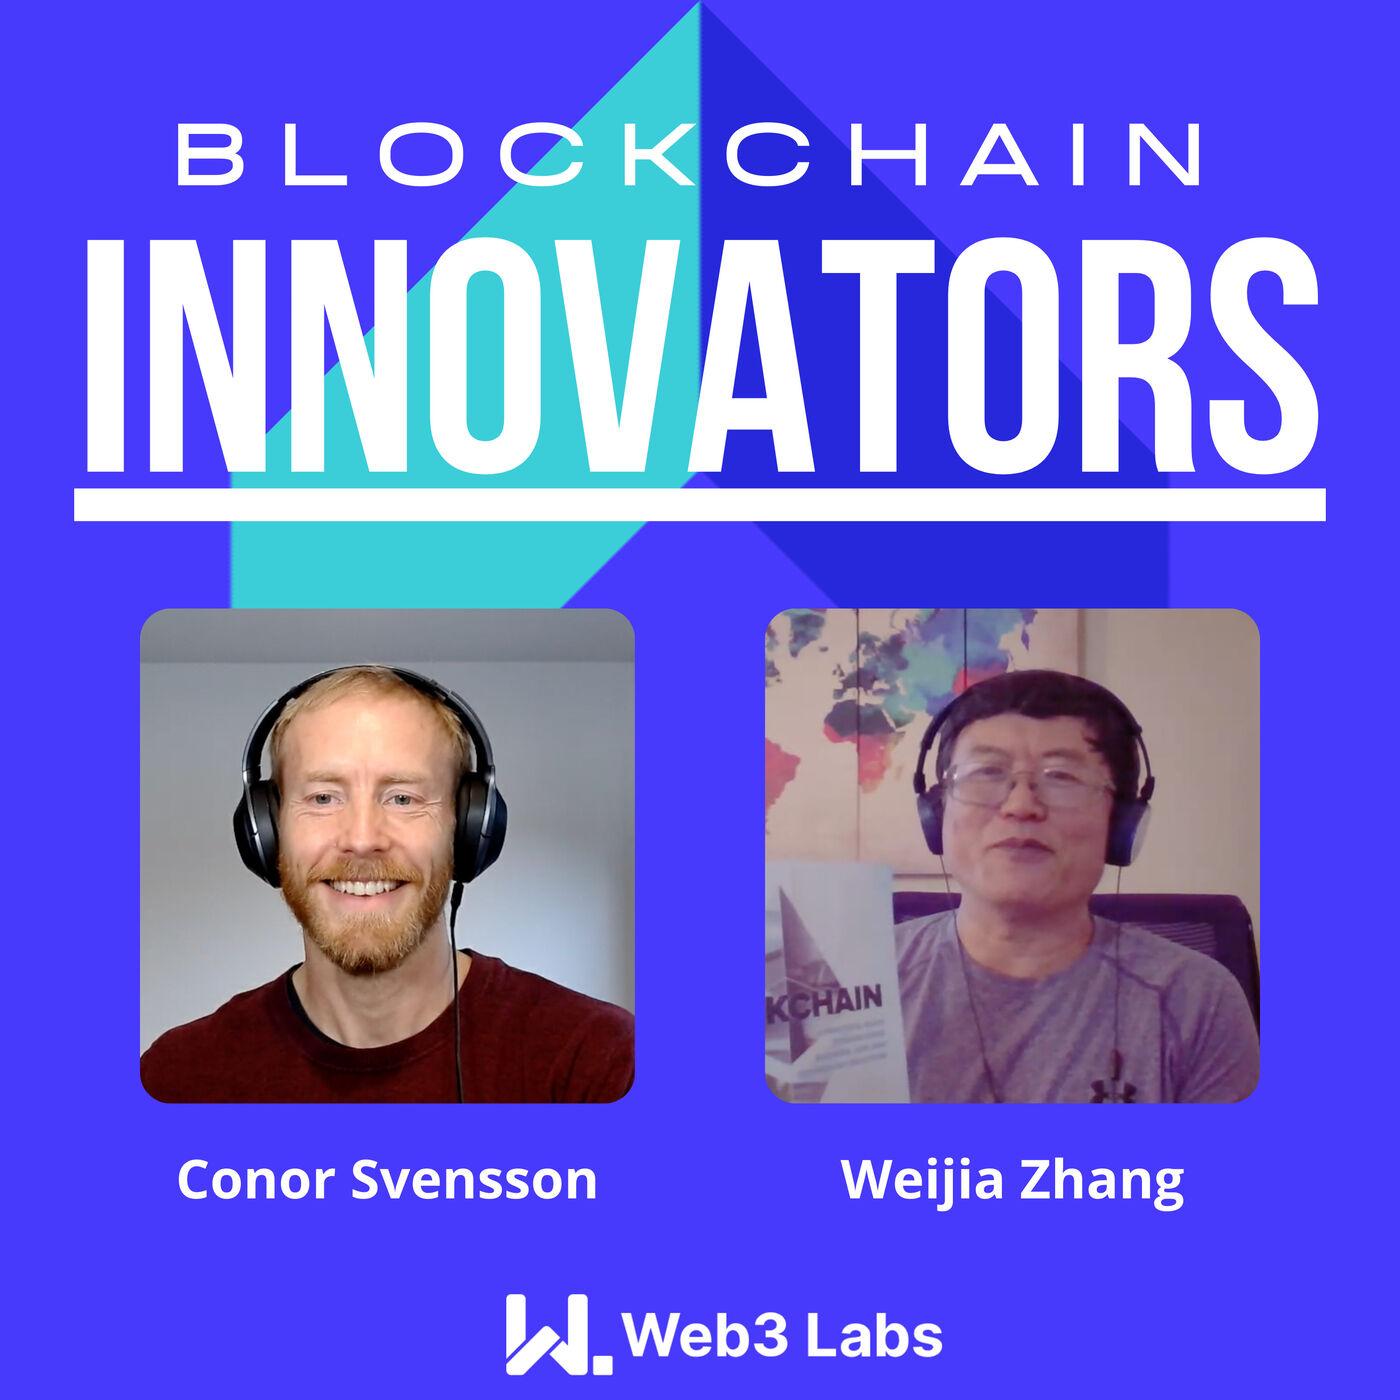 Blockchain Innovators - Conor Svensson and Weijia Zhang